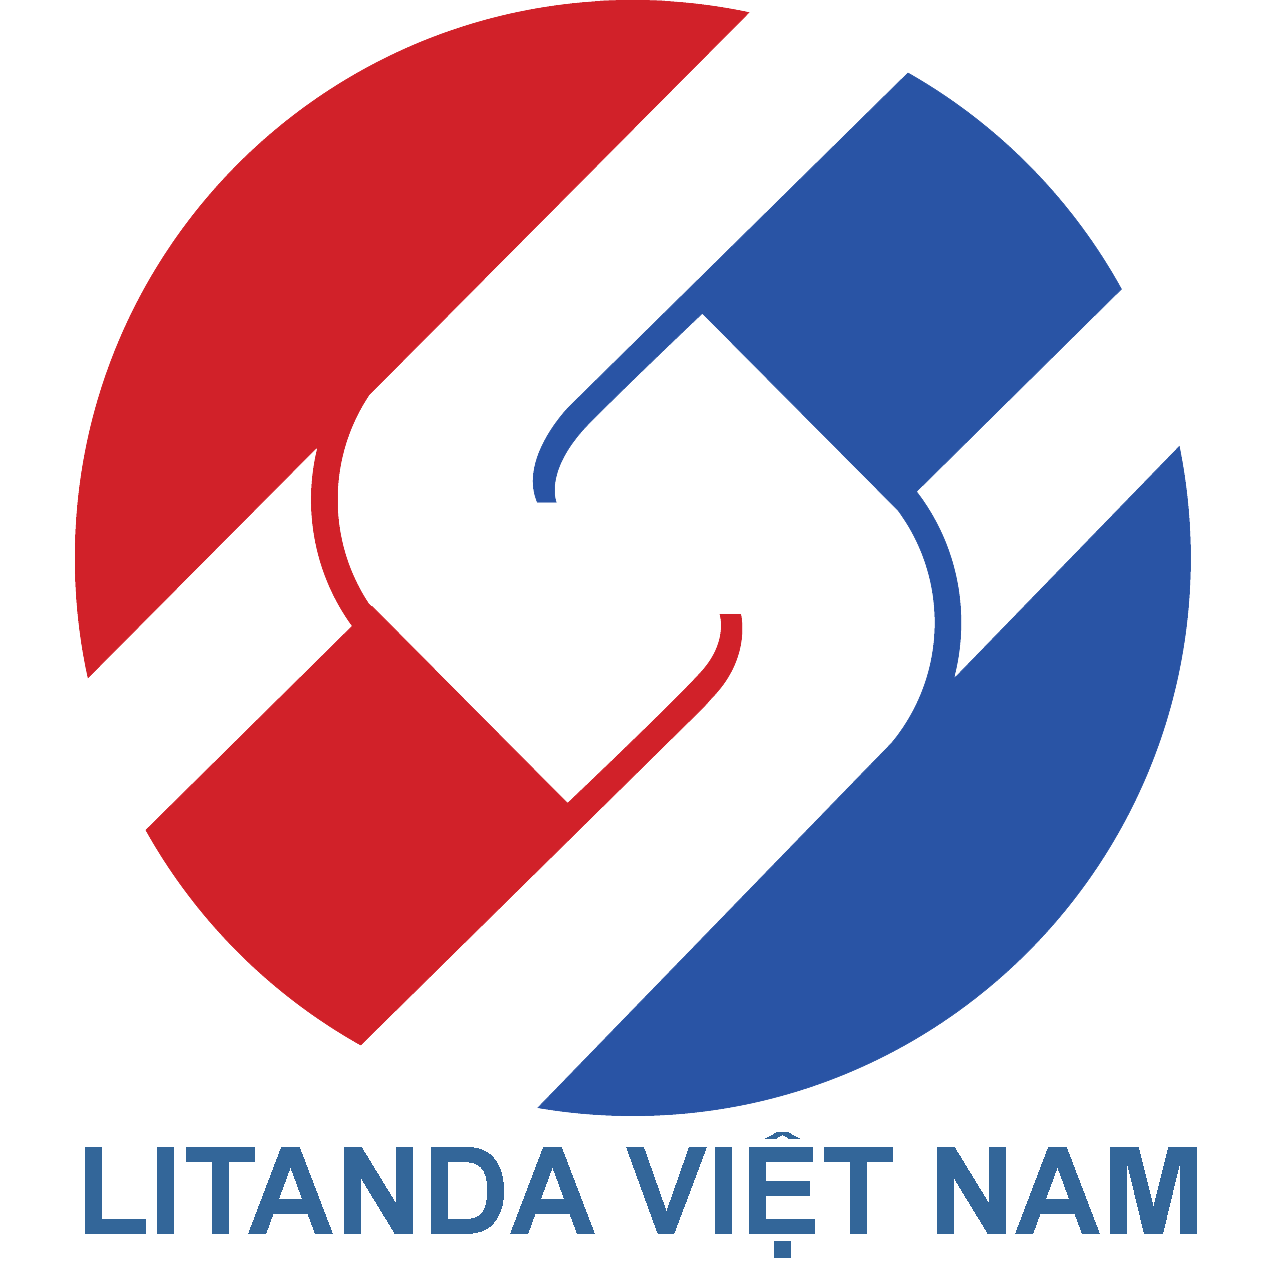 Lioa, Ổn áp Lioa, Biến áp Lioa, Công ty cổ phần Litanda Việt Nam 2021